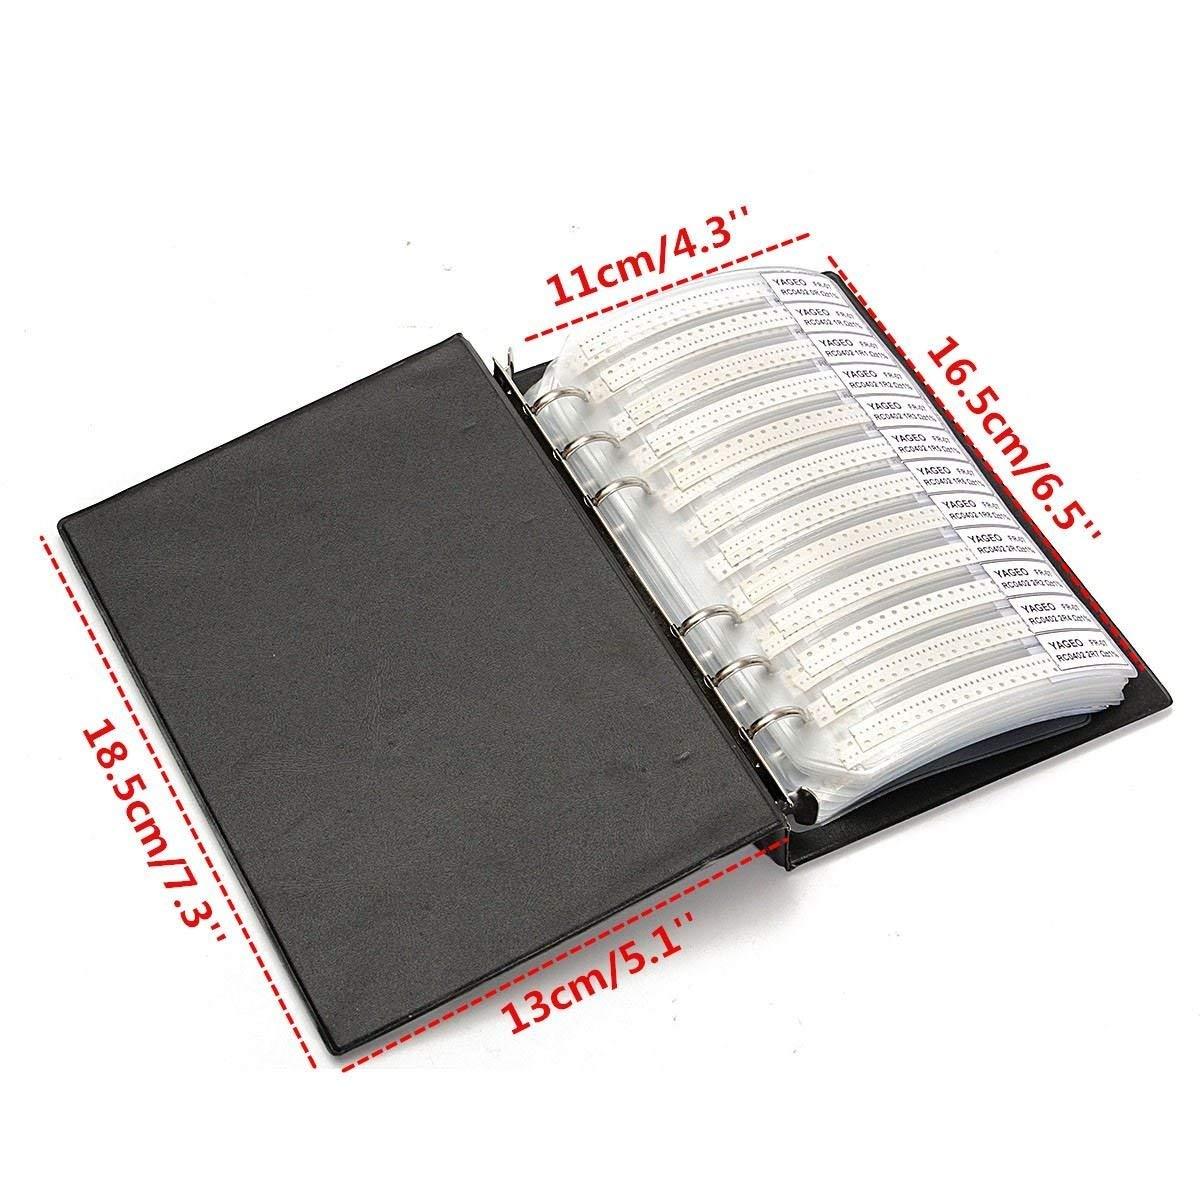 Sellify 1 PCS Noir 0402 Book Sample 1/% SMD SMT Chip Resistor 170Valuesx50pcs = 8500pcs